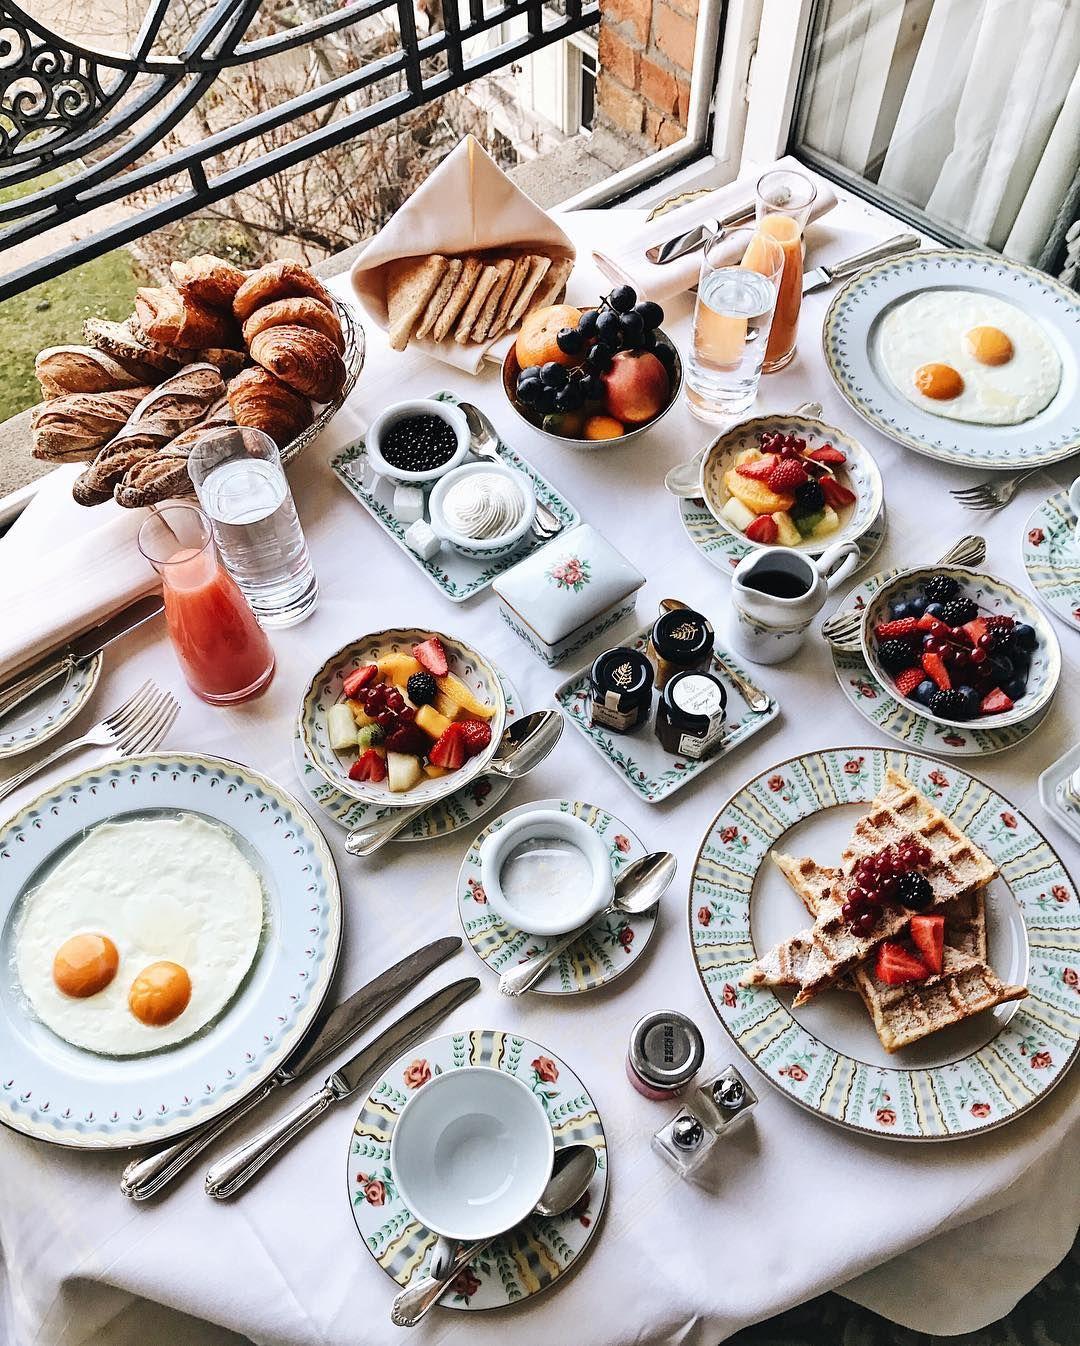 Breakfast at Four Seasons Hotel V, Paris